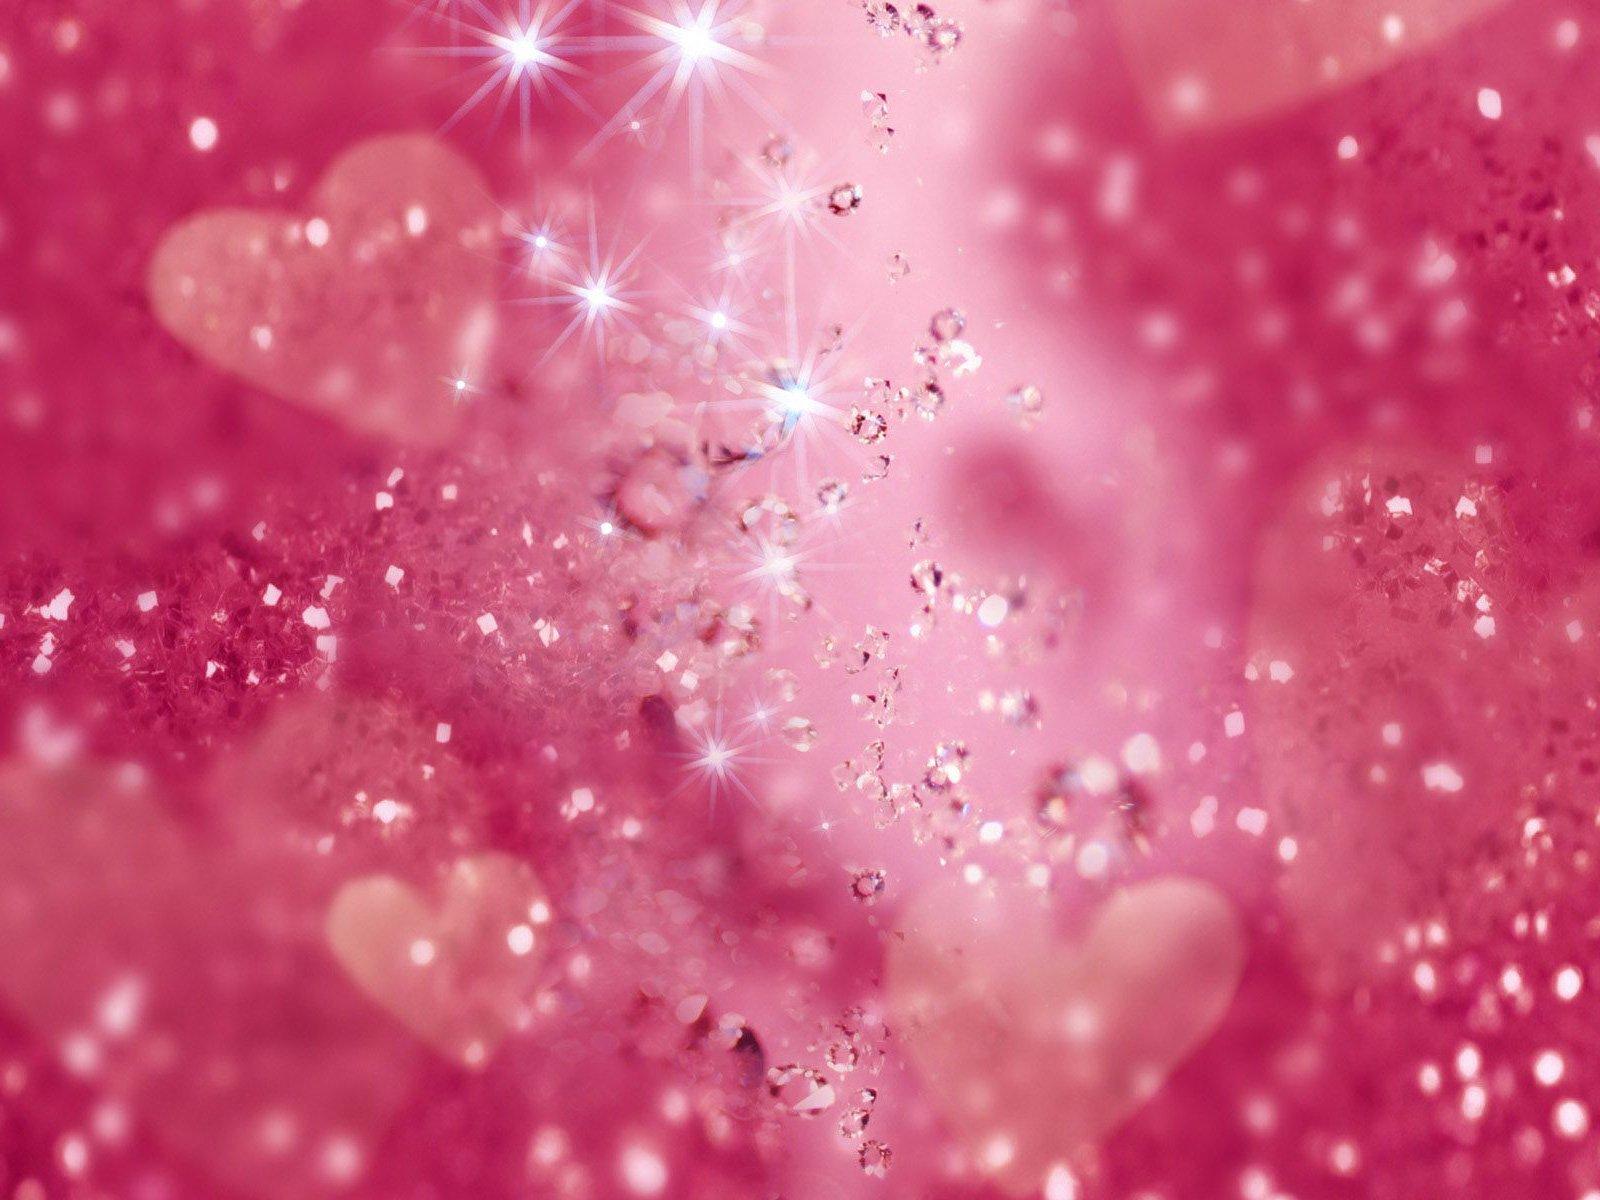 pink wallpaper love pink wallpapers cute pink wallpapers pink 1600x1200